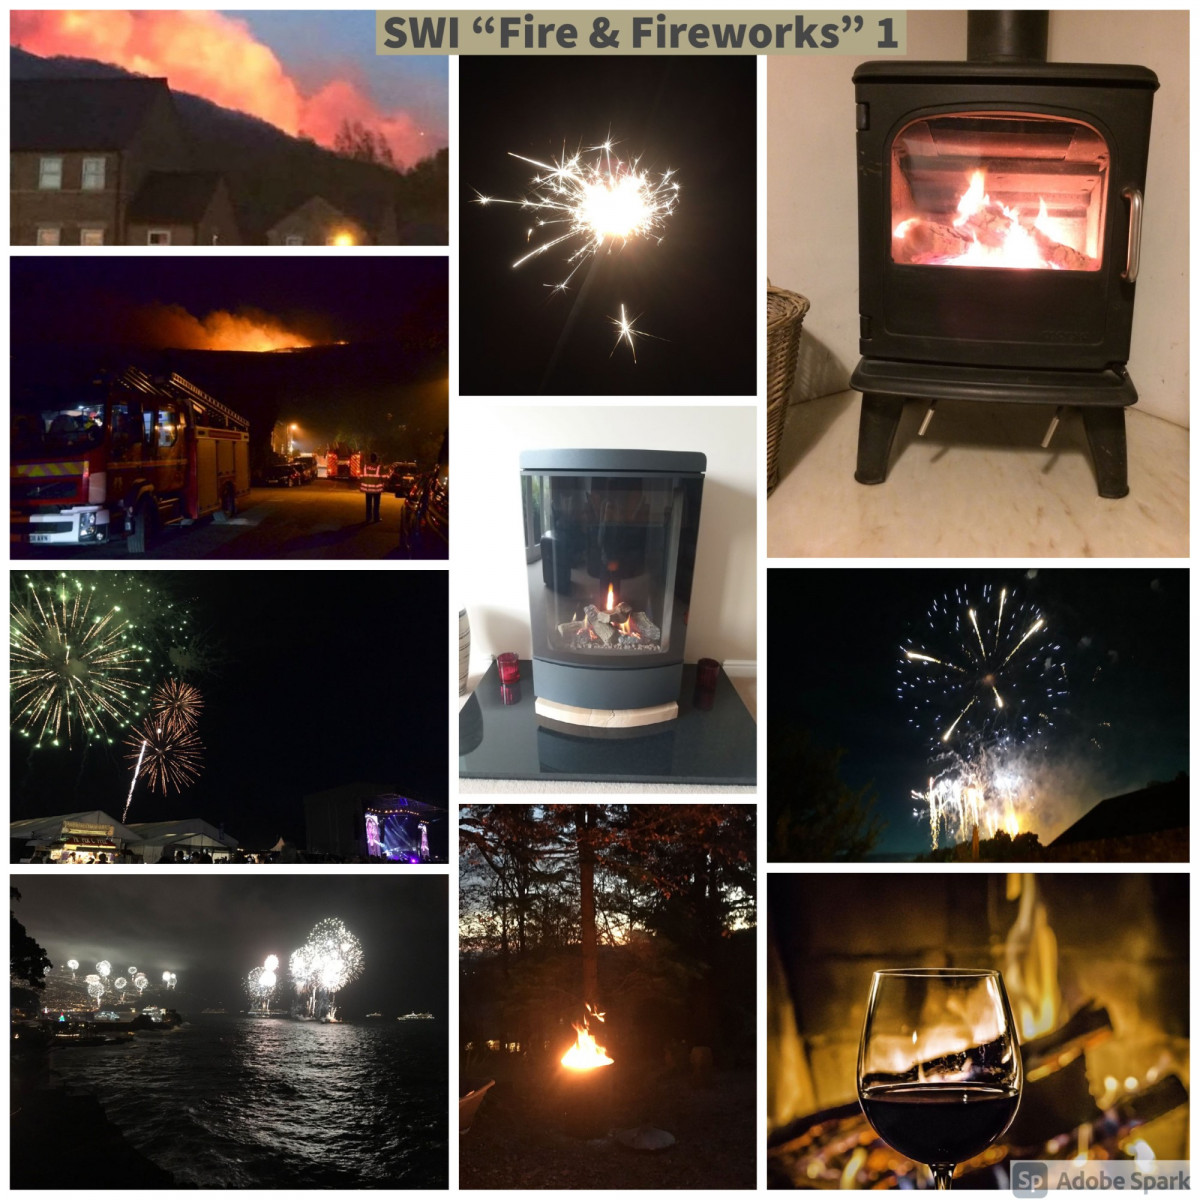 SWI-Fire-Fireworks-part1